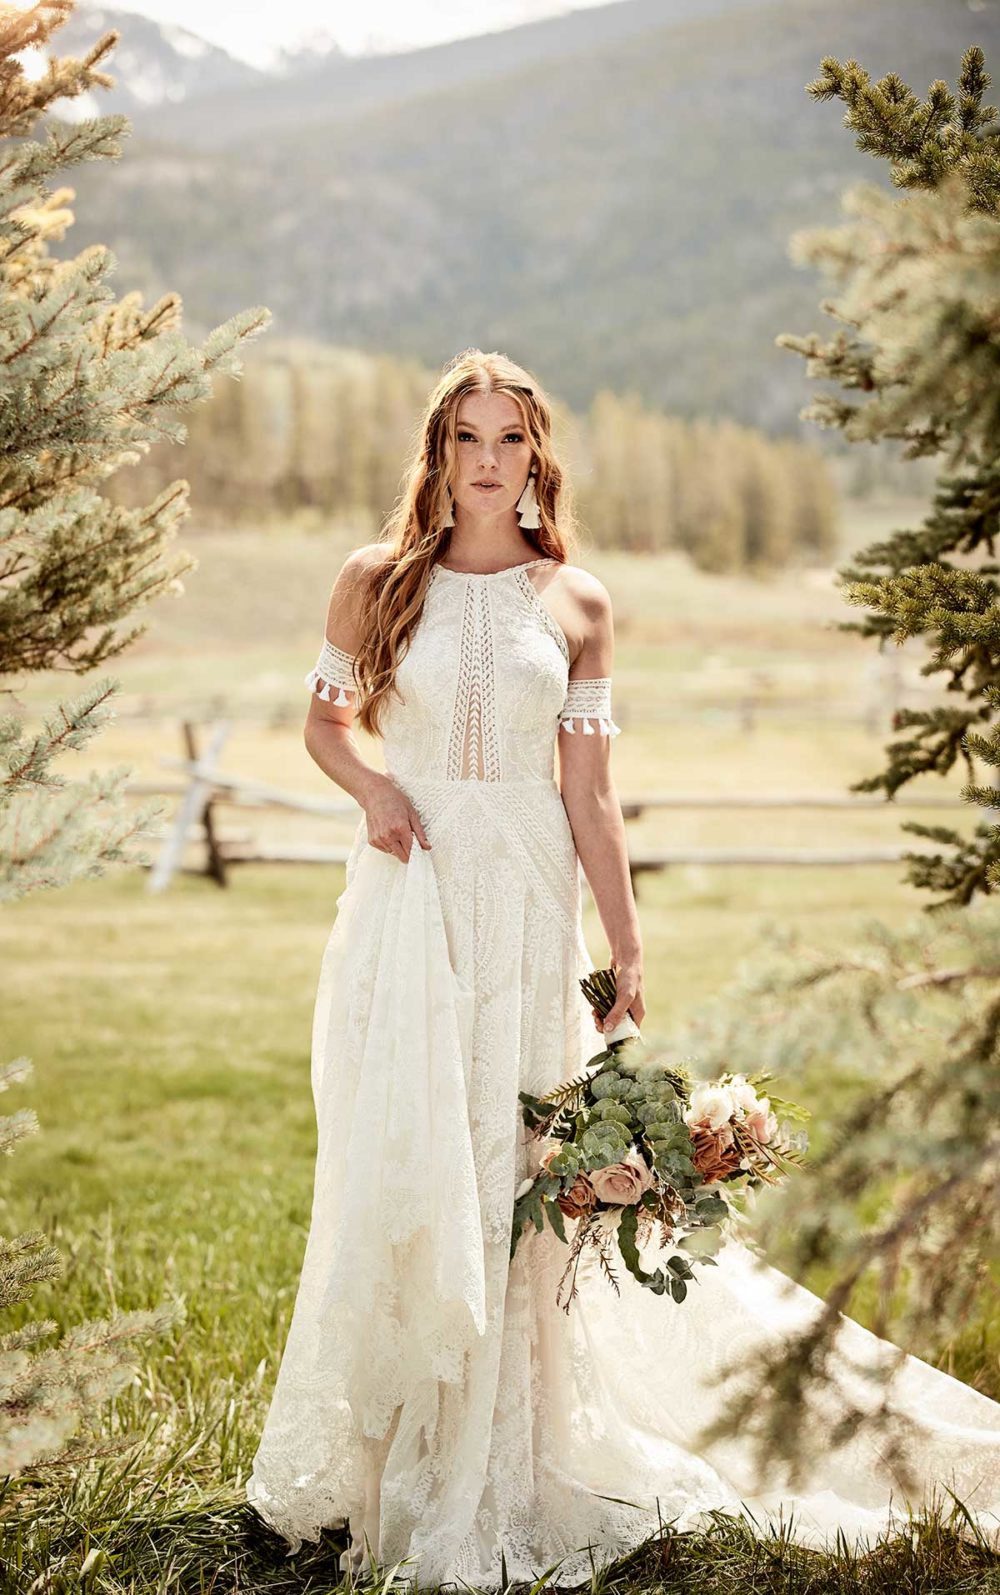 Emily-Bridalwear-India-All-who-wander